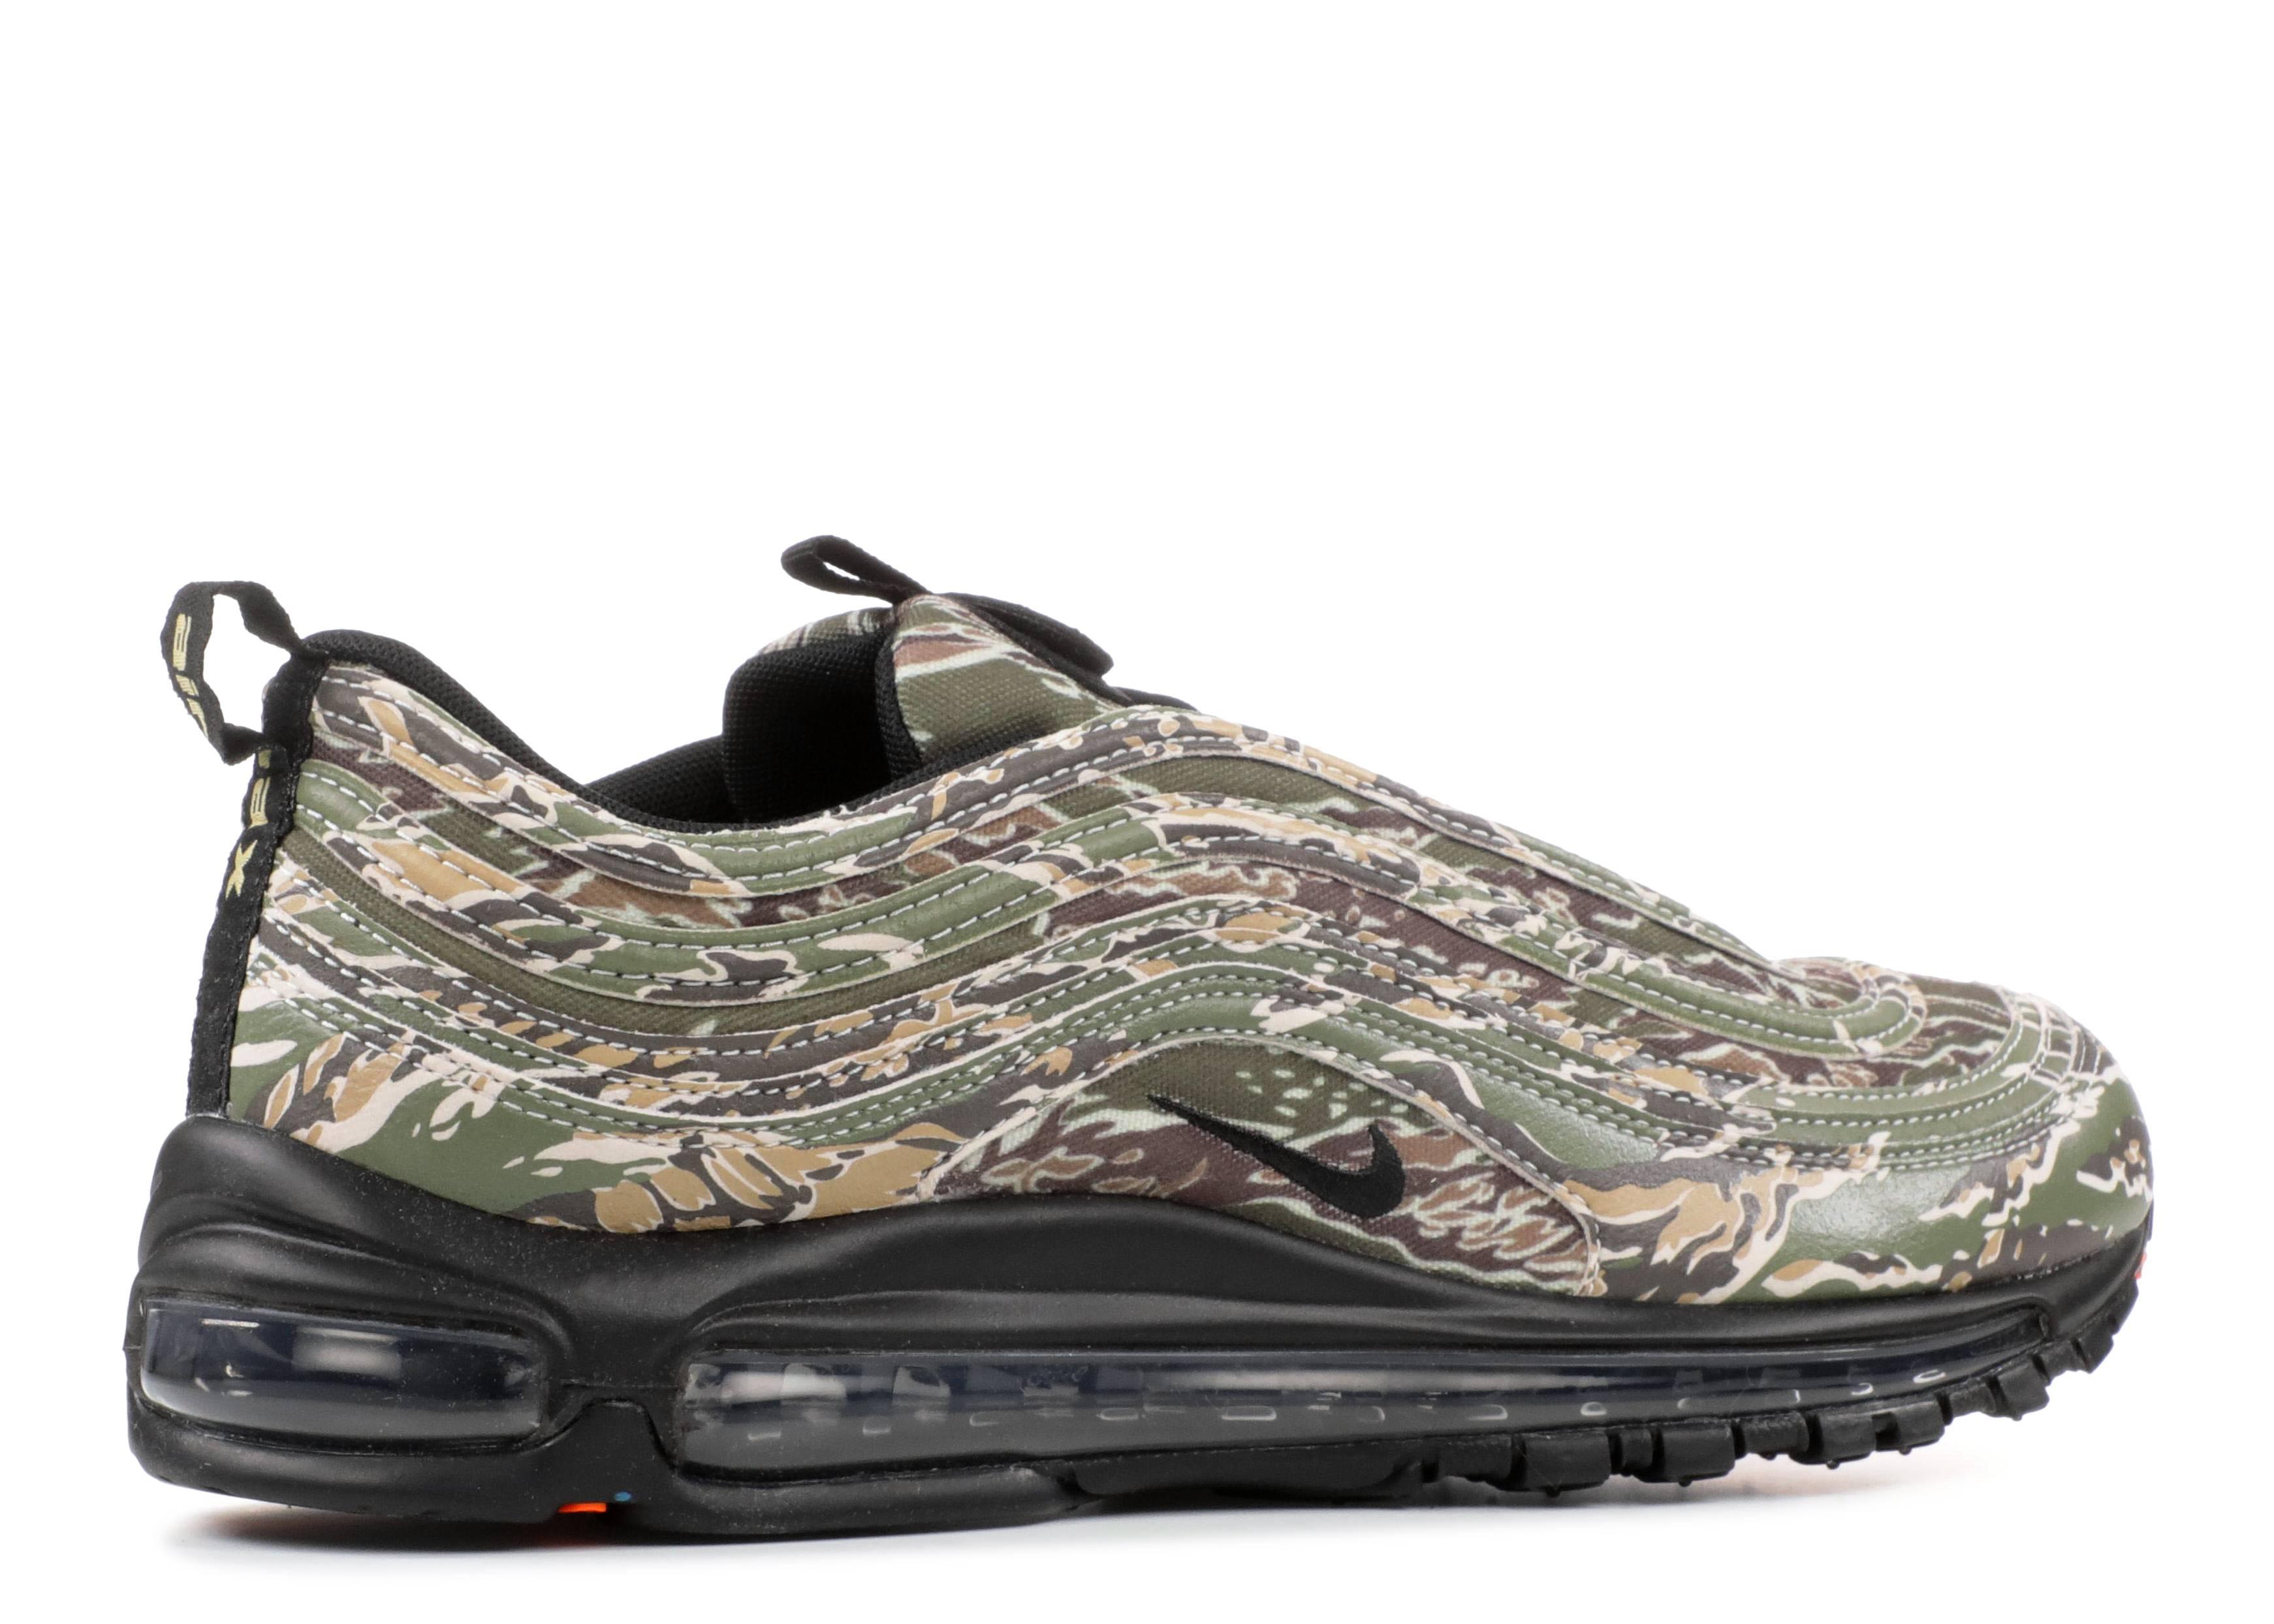 sale retailer de23d 8c0f3 Nike Air Max 97 Premium Qs